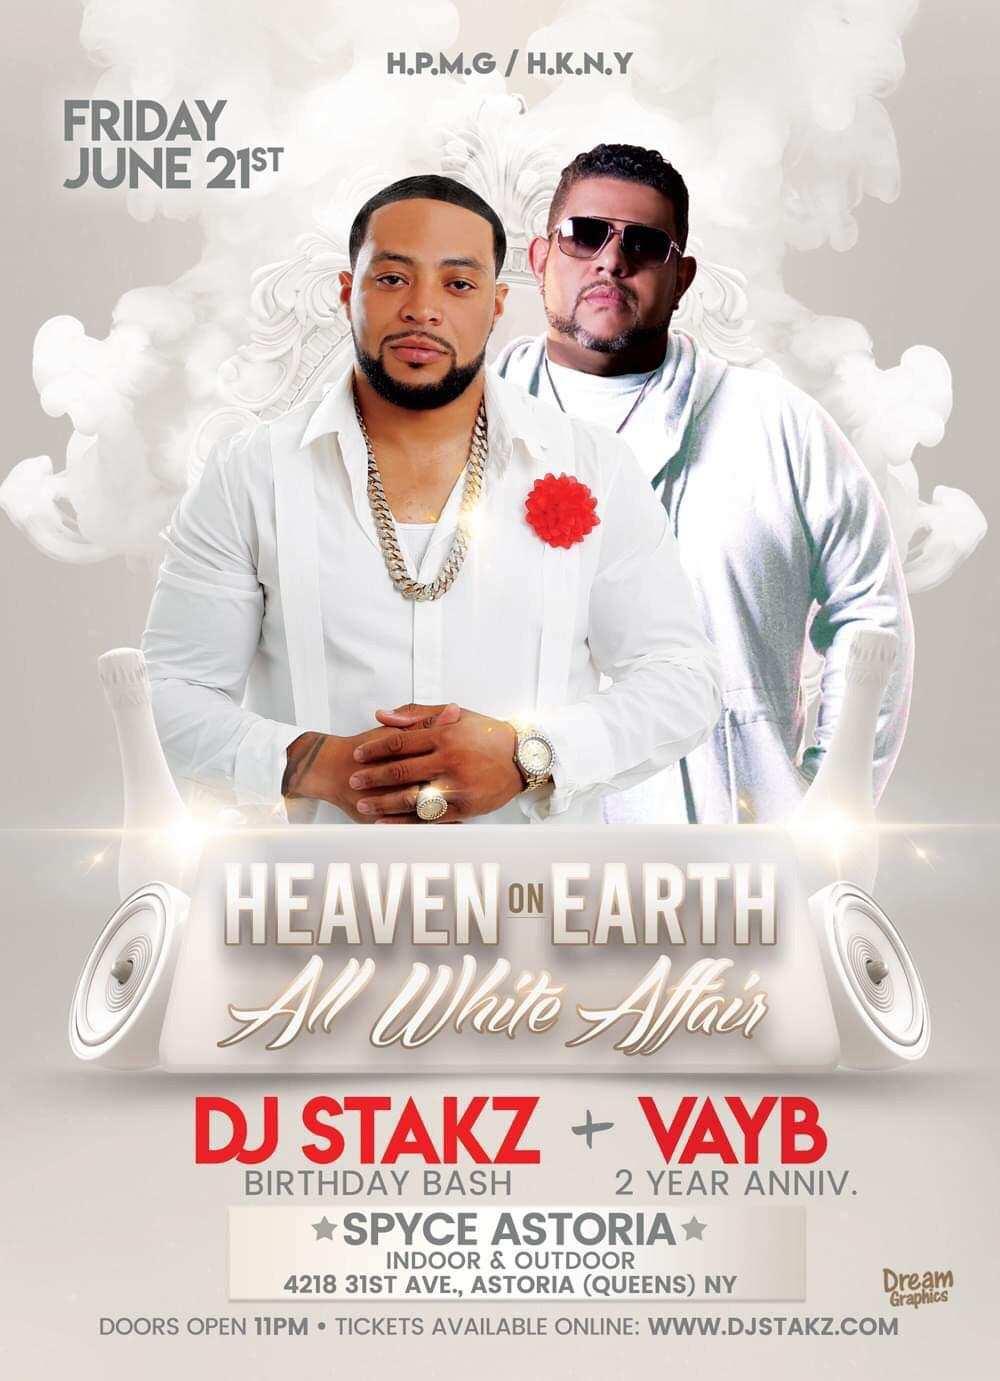 DJ Stakz Celebrity Status Birthday Weekend - Heaven on Earth - June 21.jpg